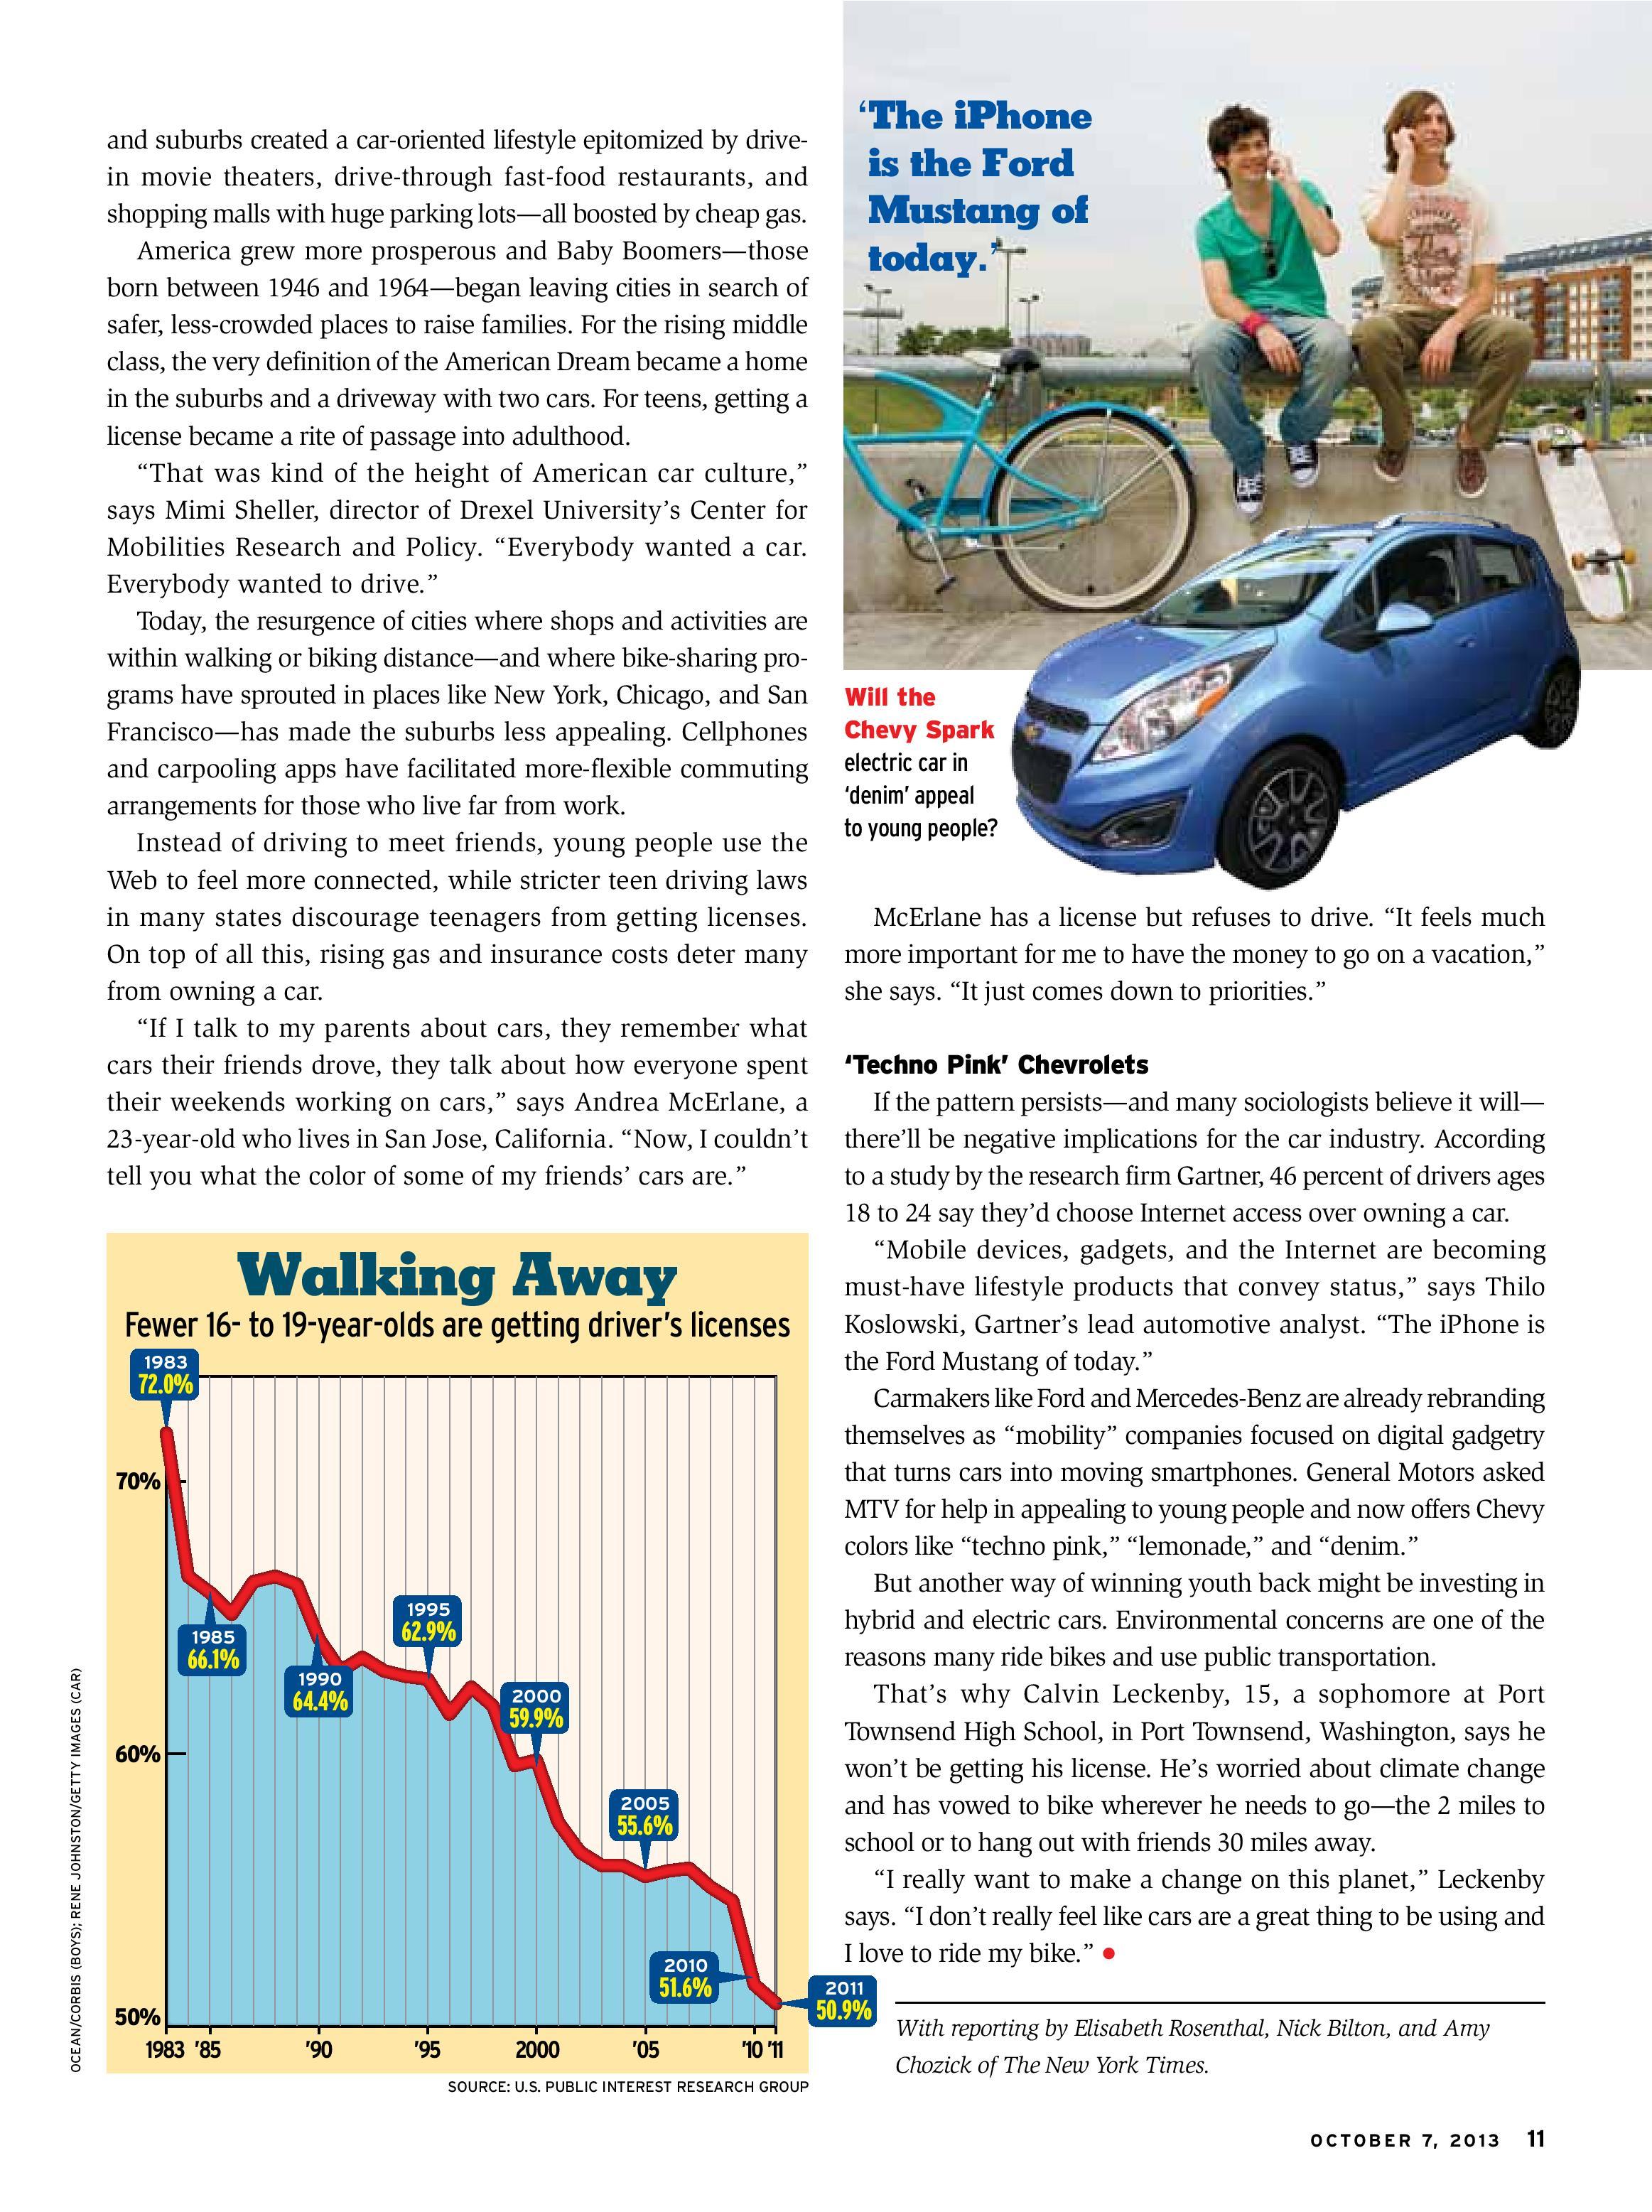 03-UPF-100713car culture-page-002.jpg